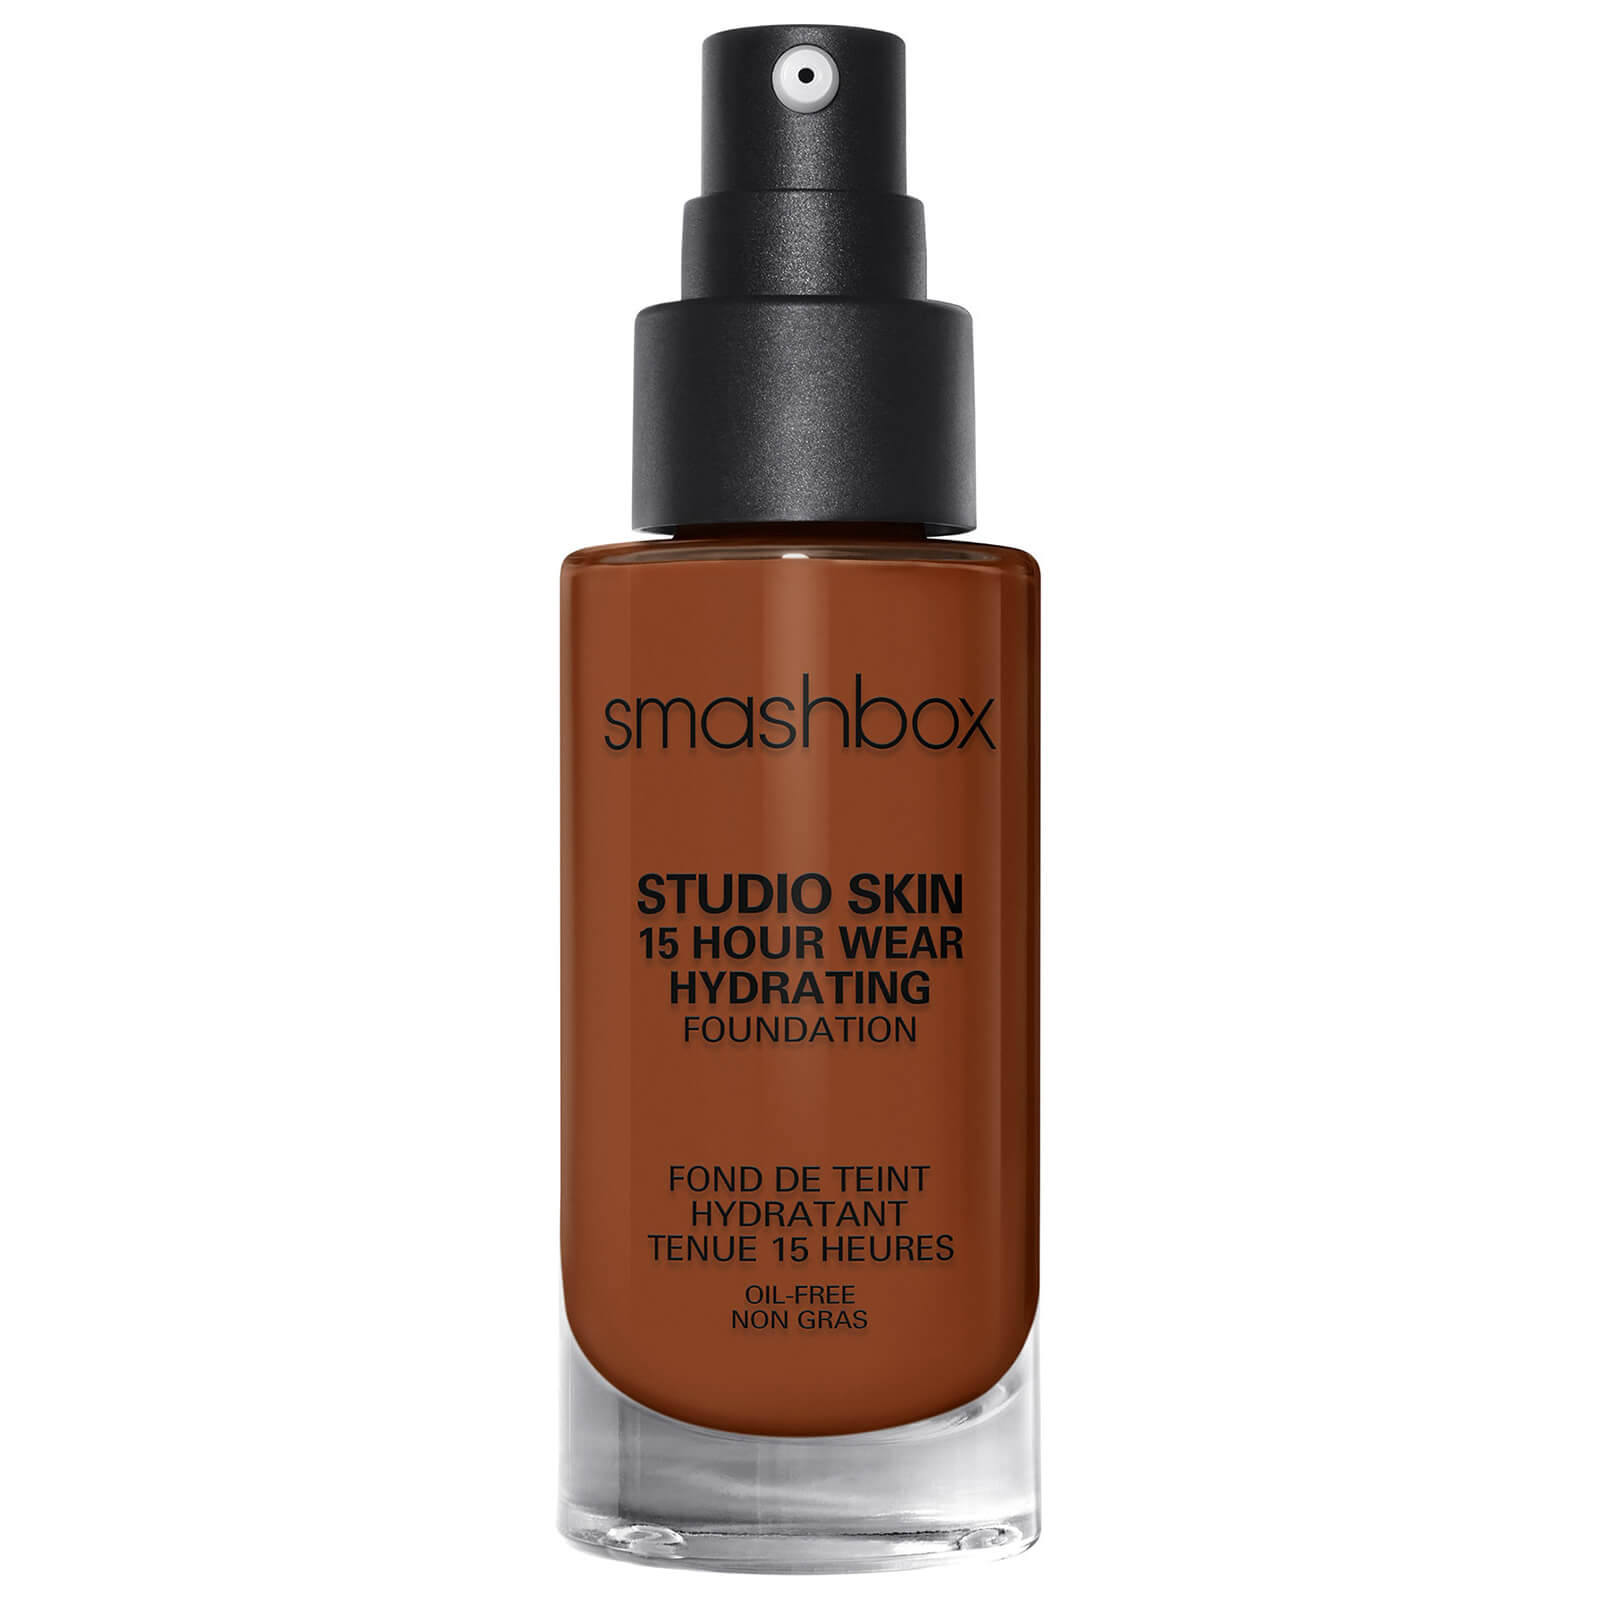 Smashbox Studio Skin 15 Hour Wear Hydrating Foundation (Various Shades) - 4.3